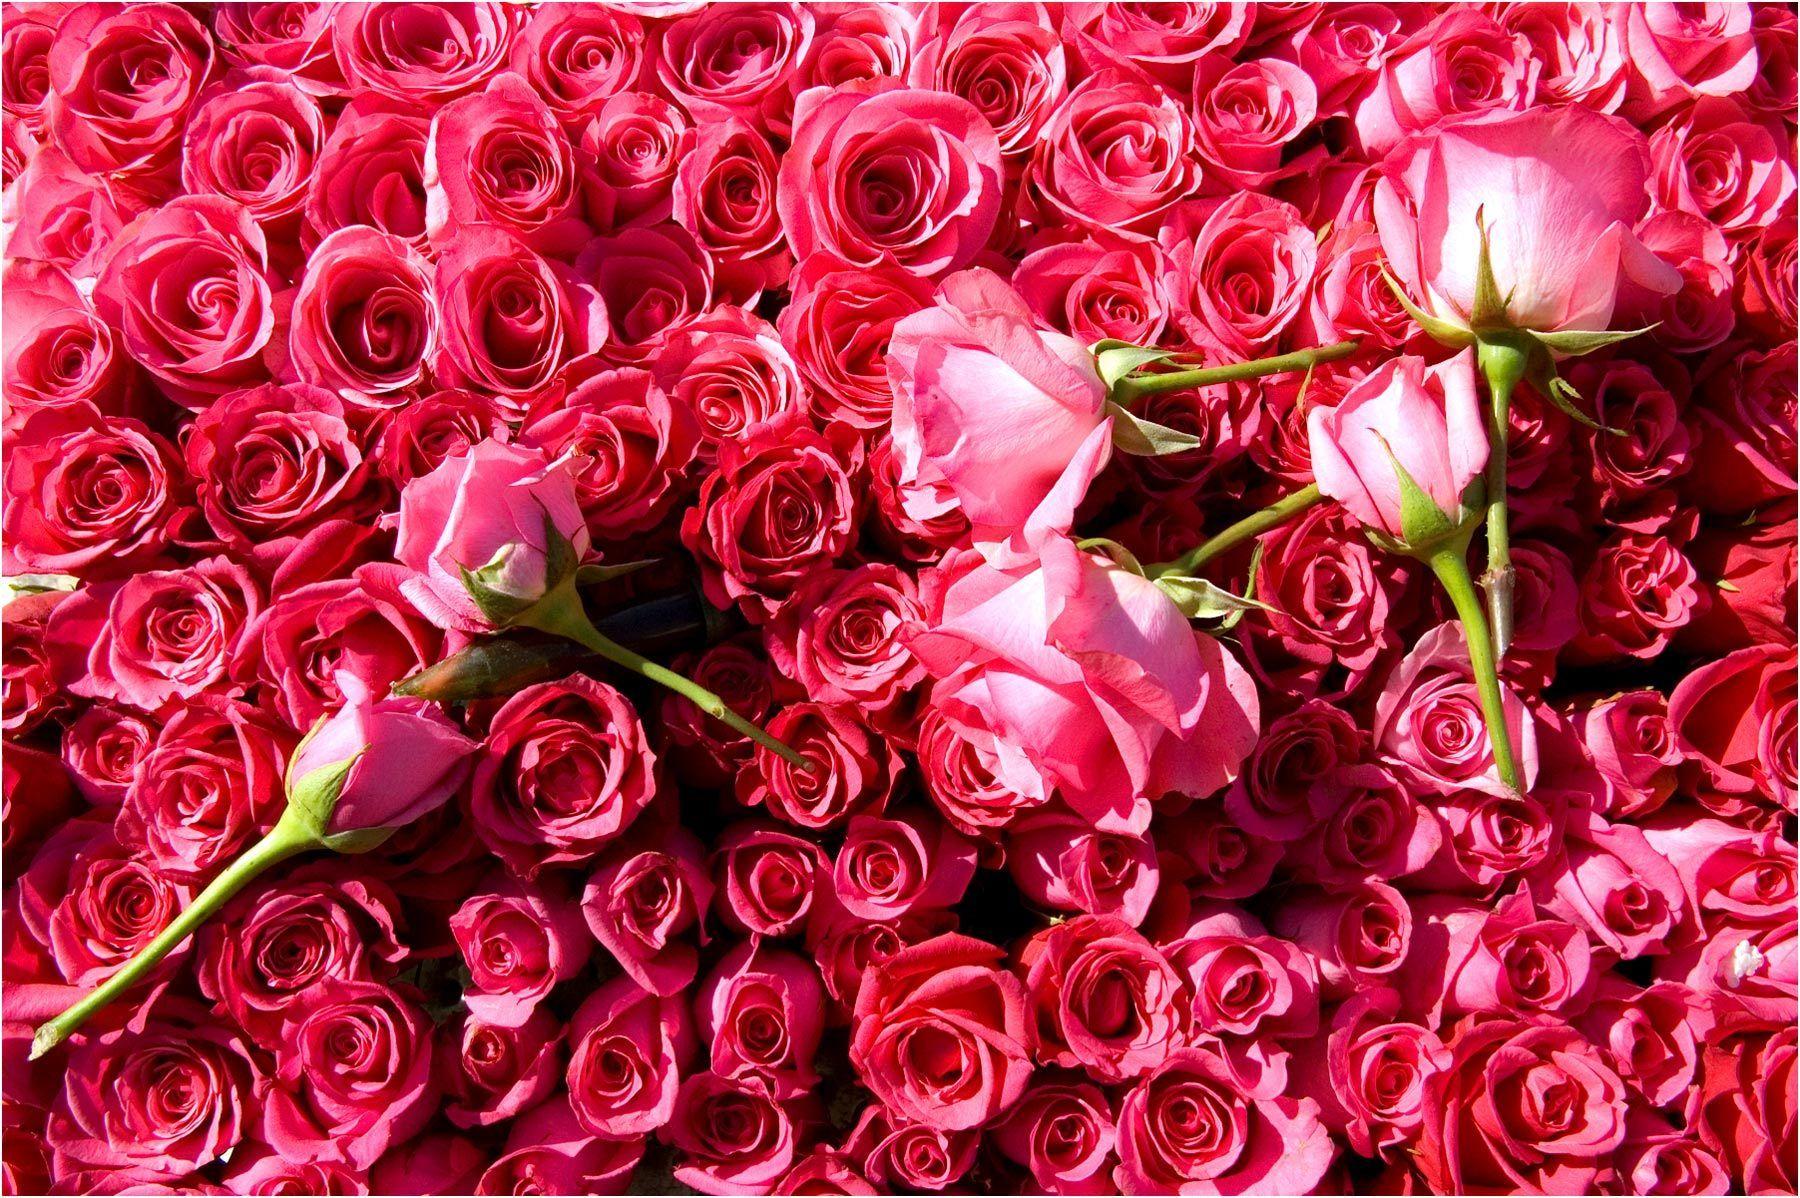 1flat_of_pink_roses.jpg